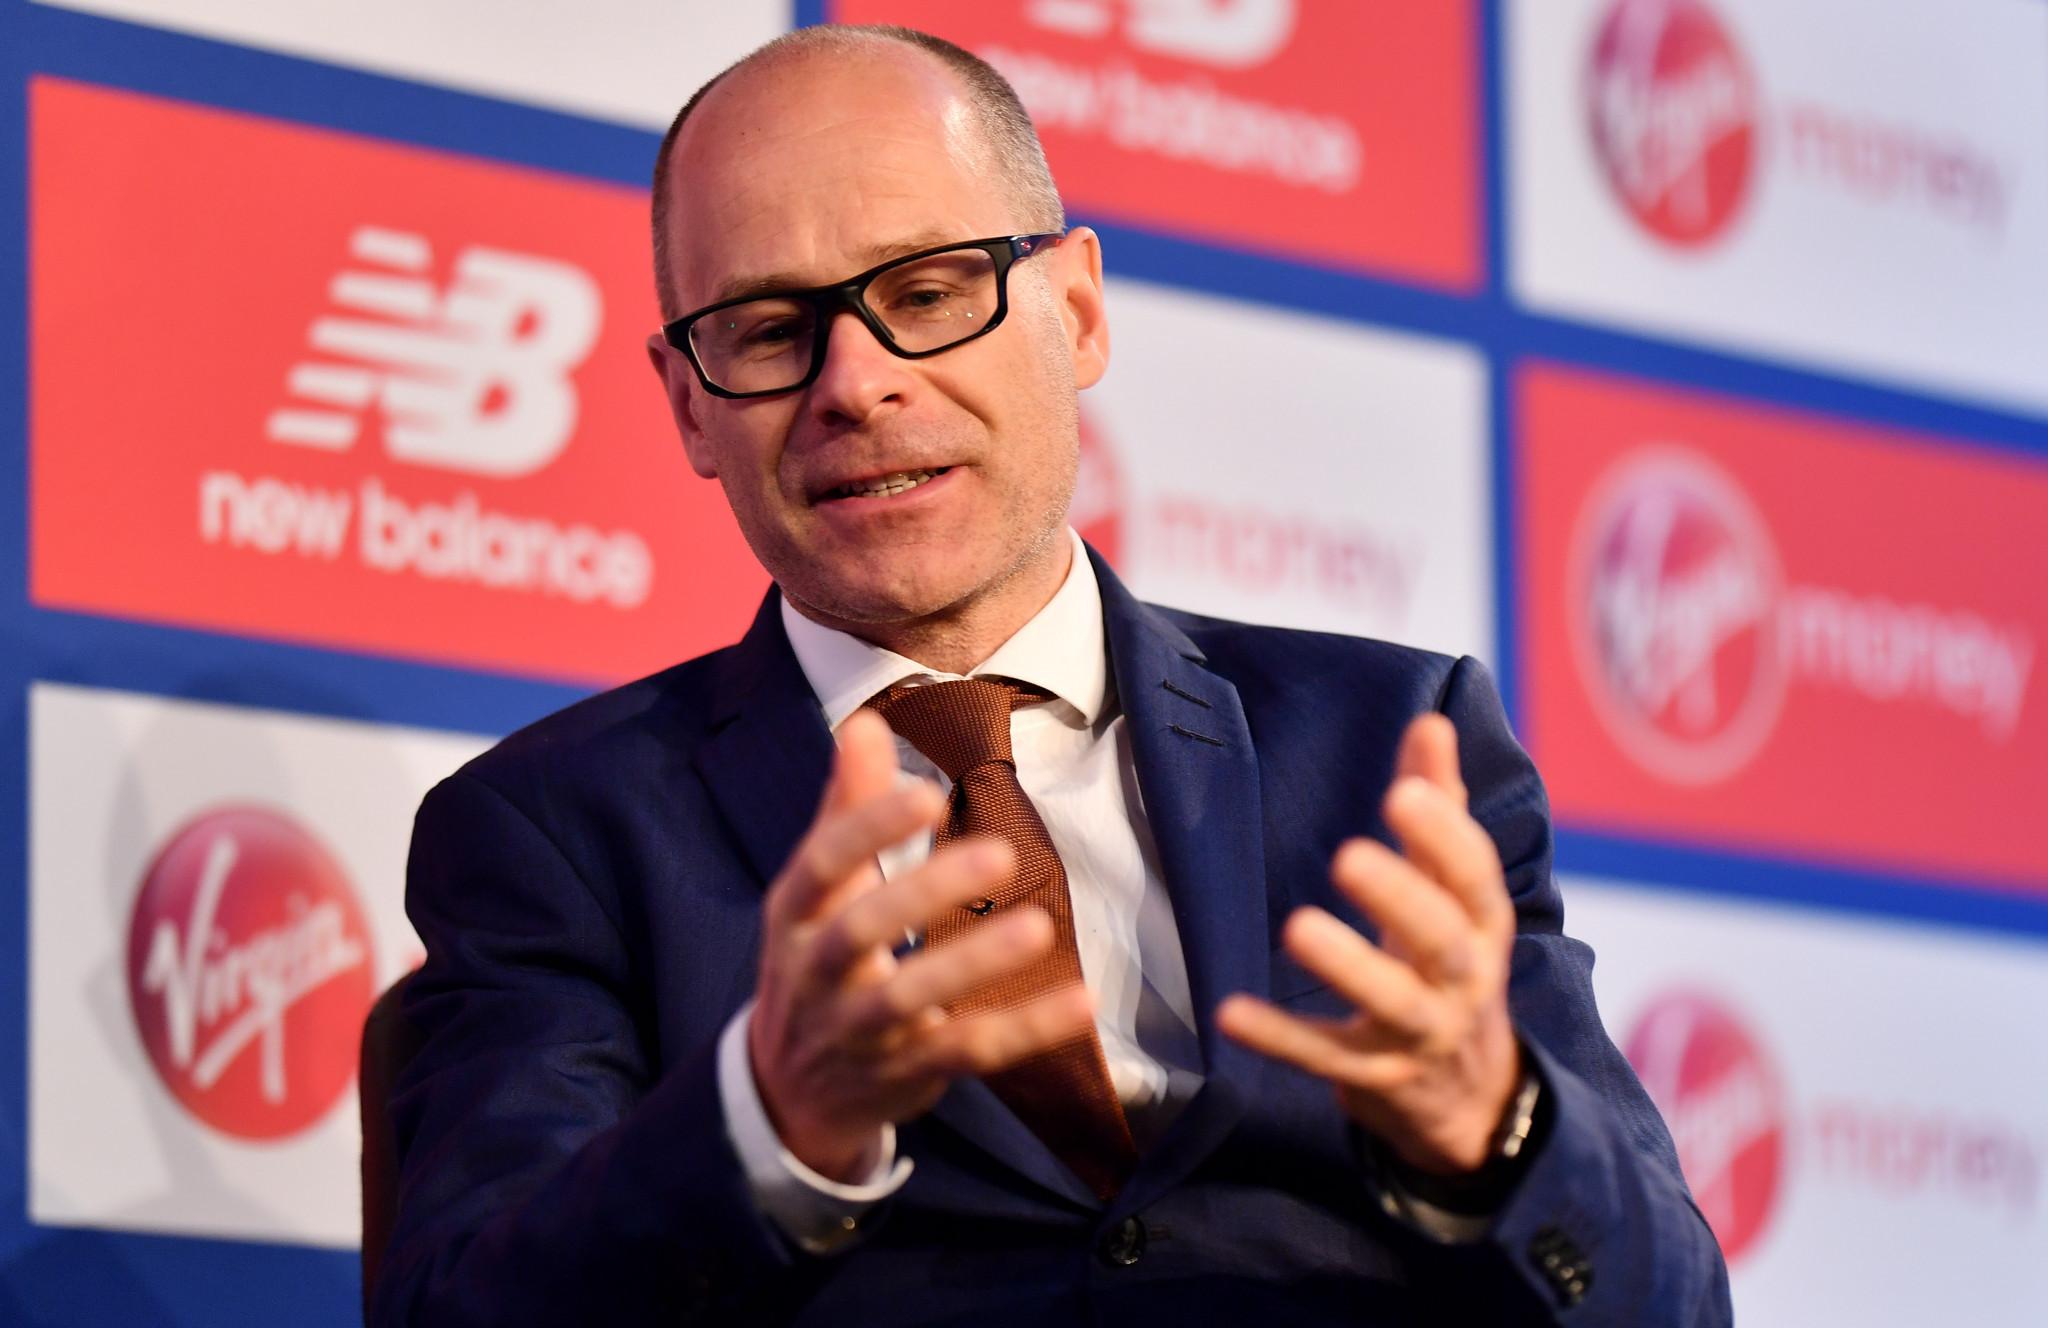 London Marathon director Hugh Brasher has spoken of the uncertainty surrounding the event ©Getty Images